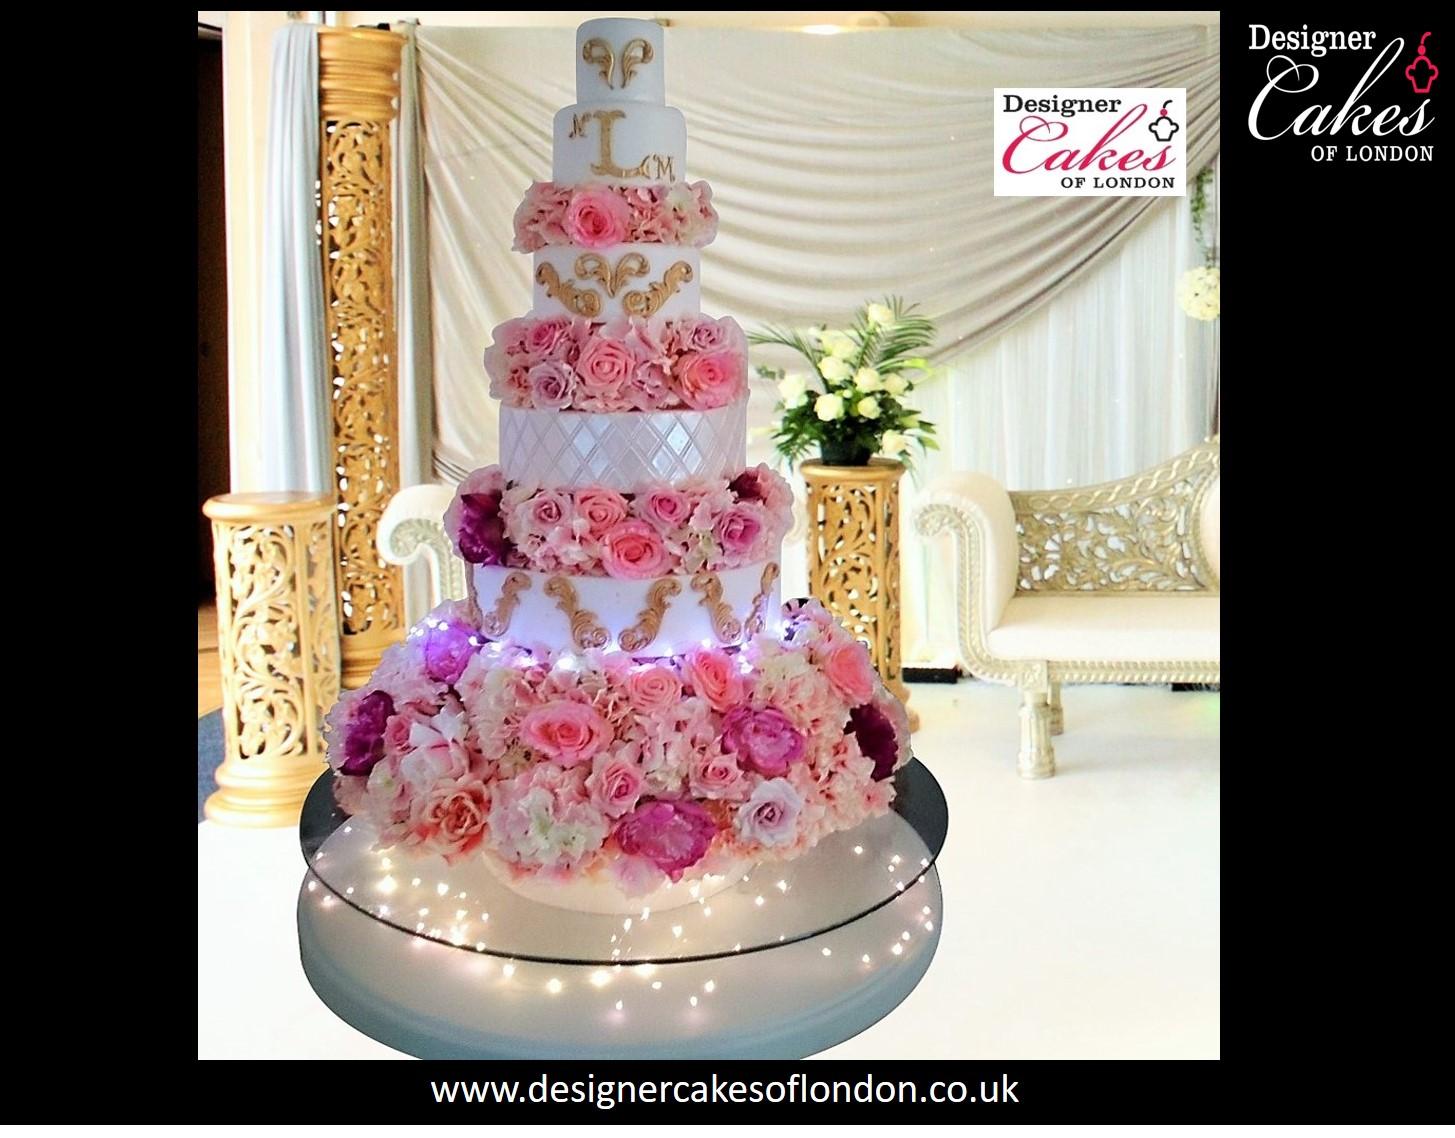 Best cake designers london